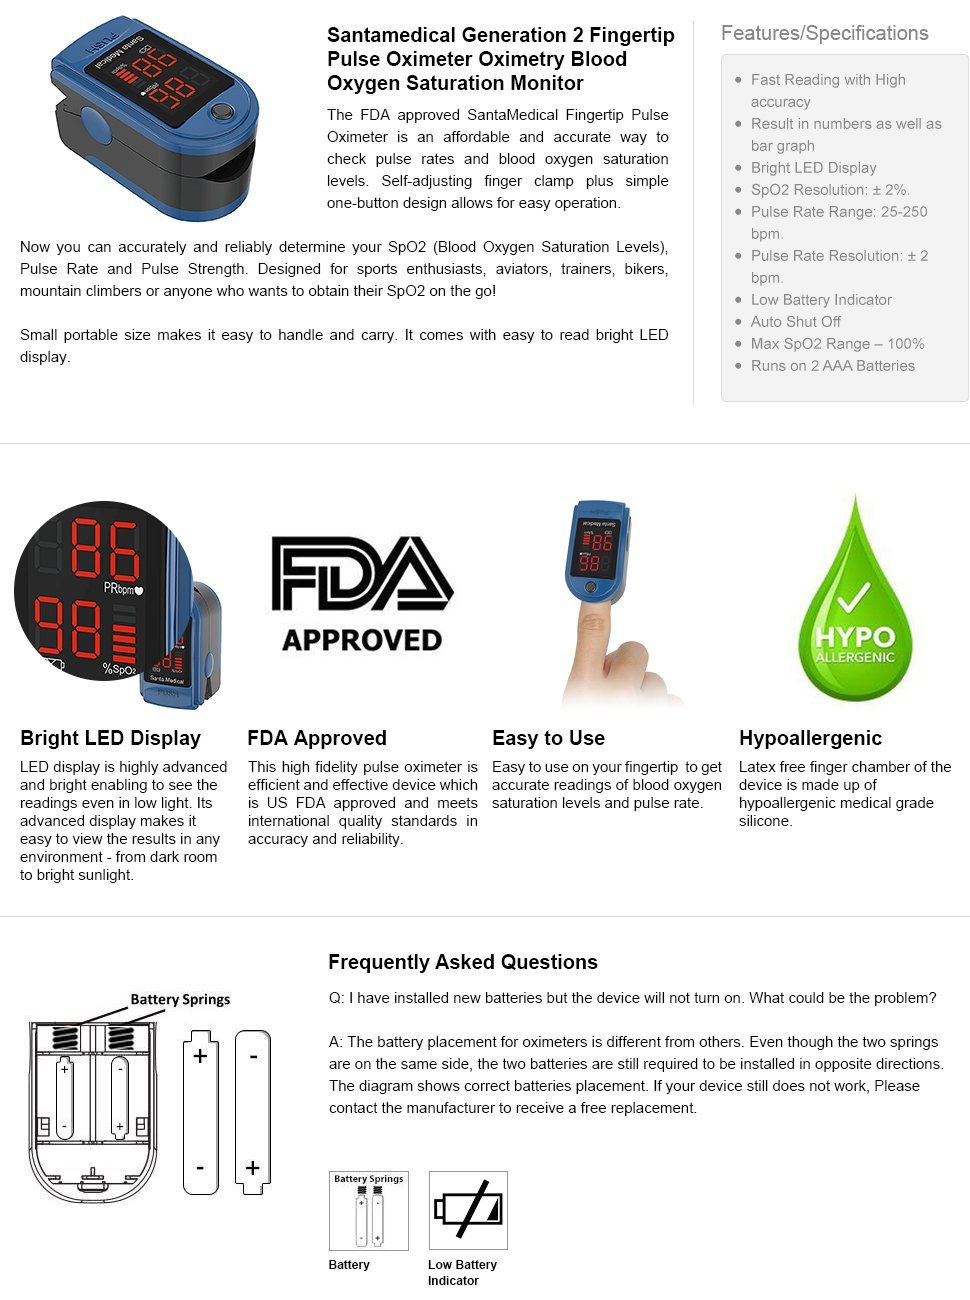 Amazon com: Santamedical Generation 2 Fingertip Pulse